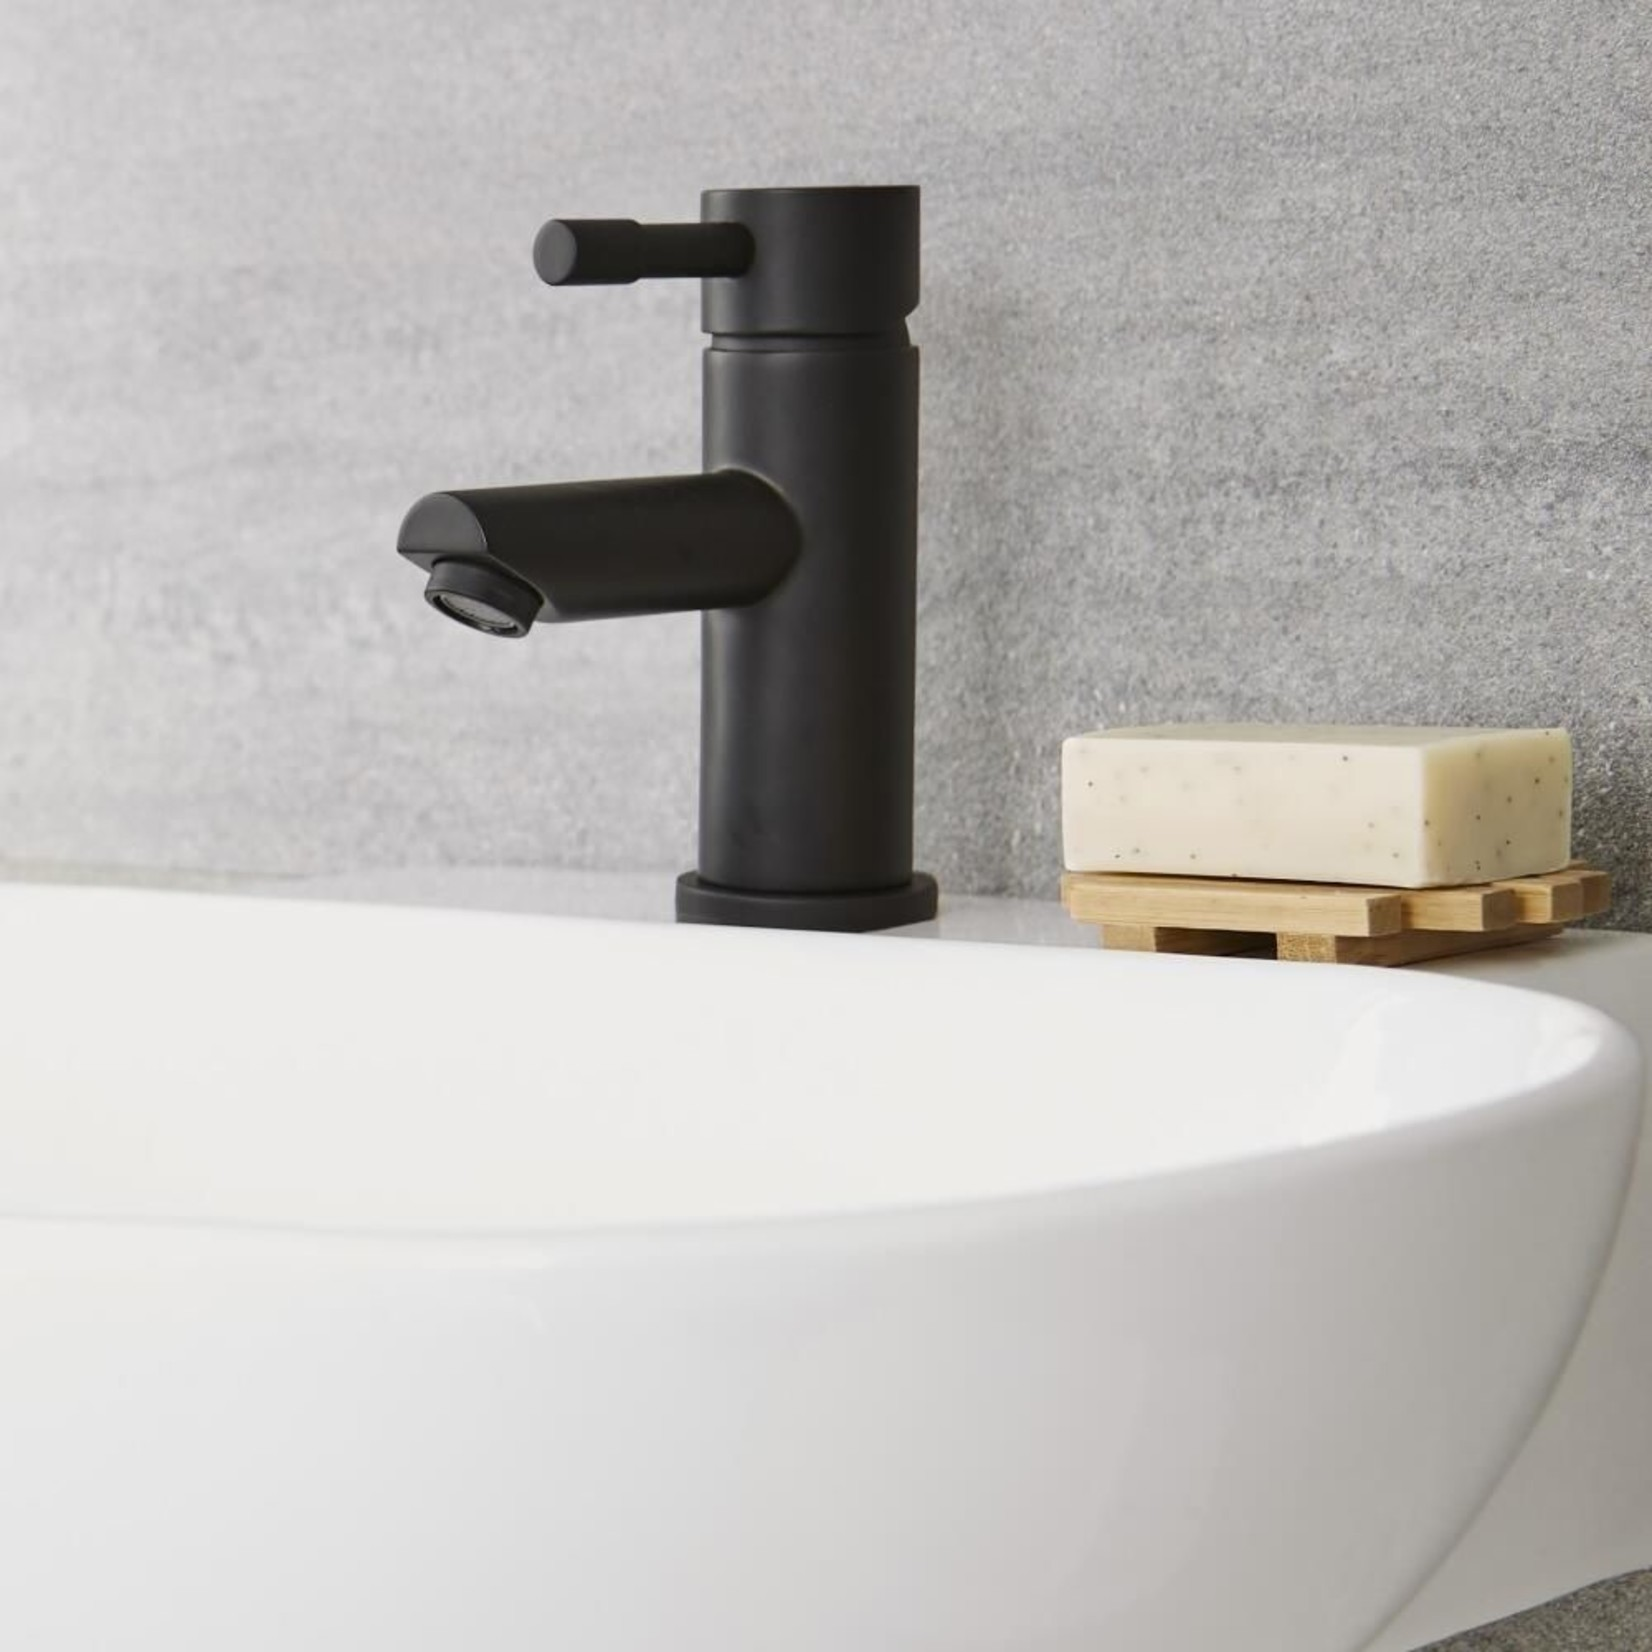 Robinet de lavabo noir mat NRD-204-MB Nortrends